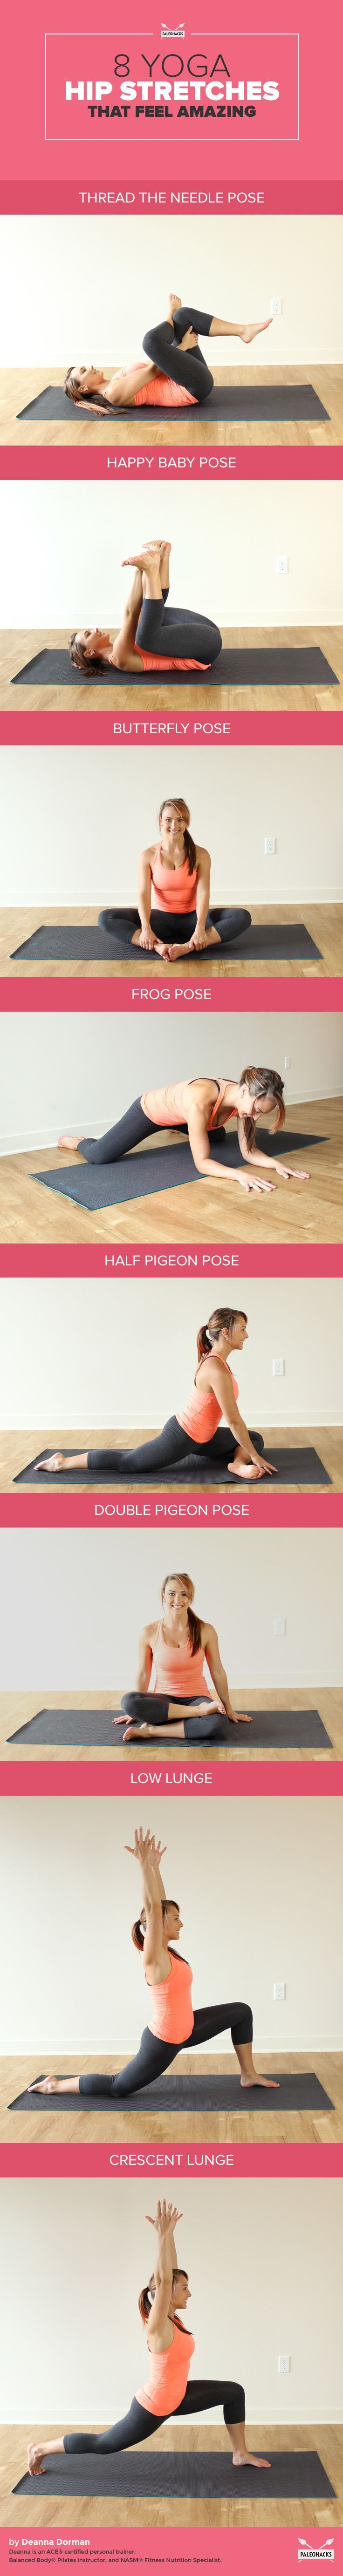 8_Yoga_Hip_Stretches_That_Feel_Amazing.jpg